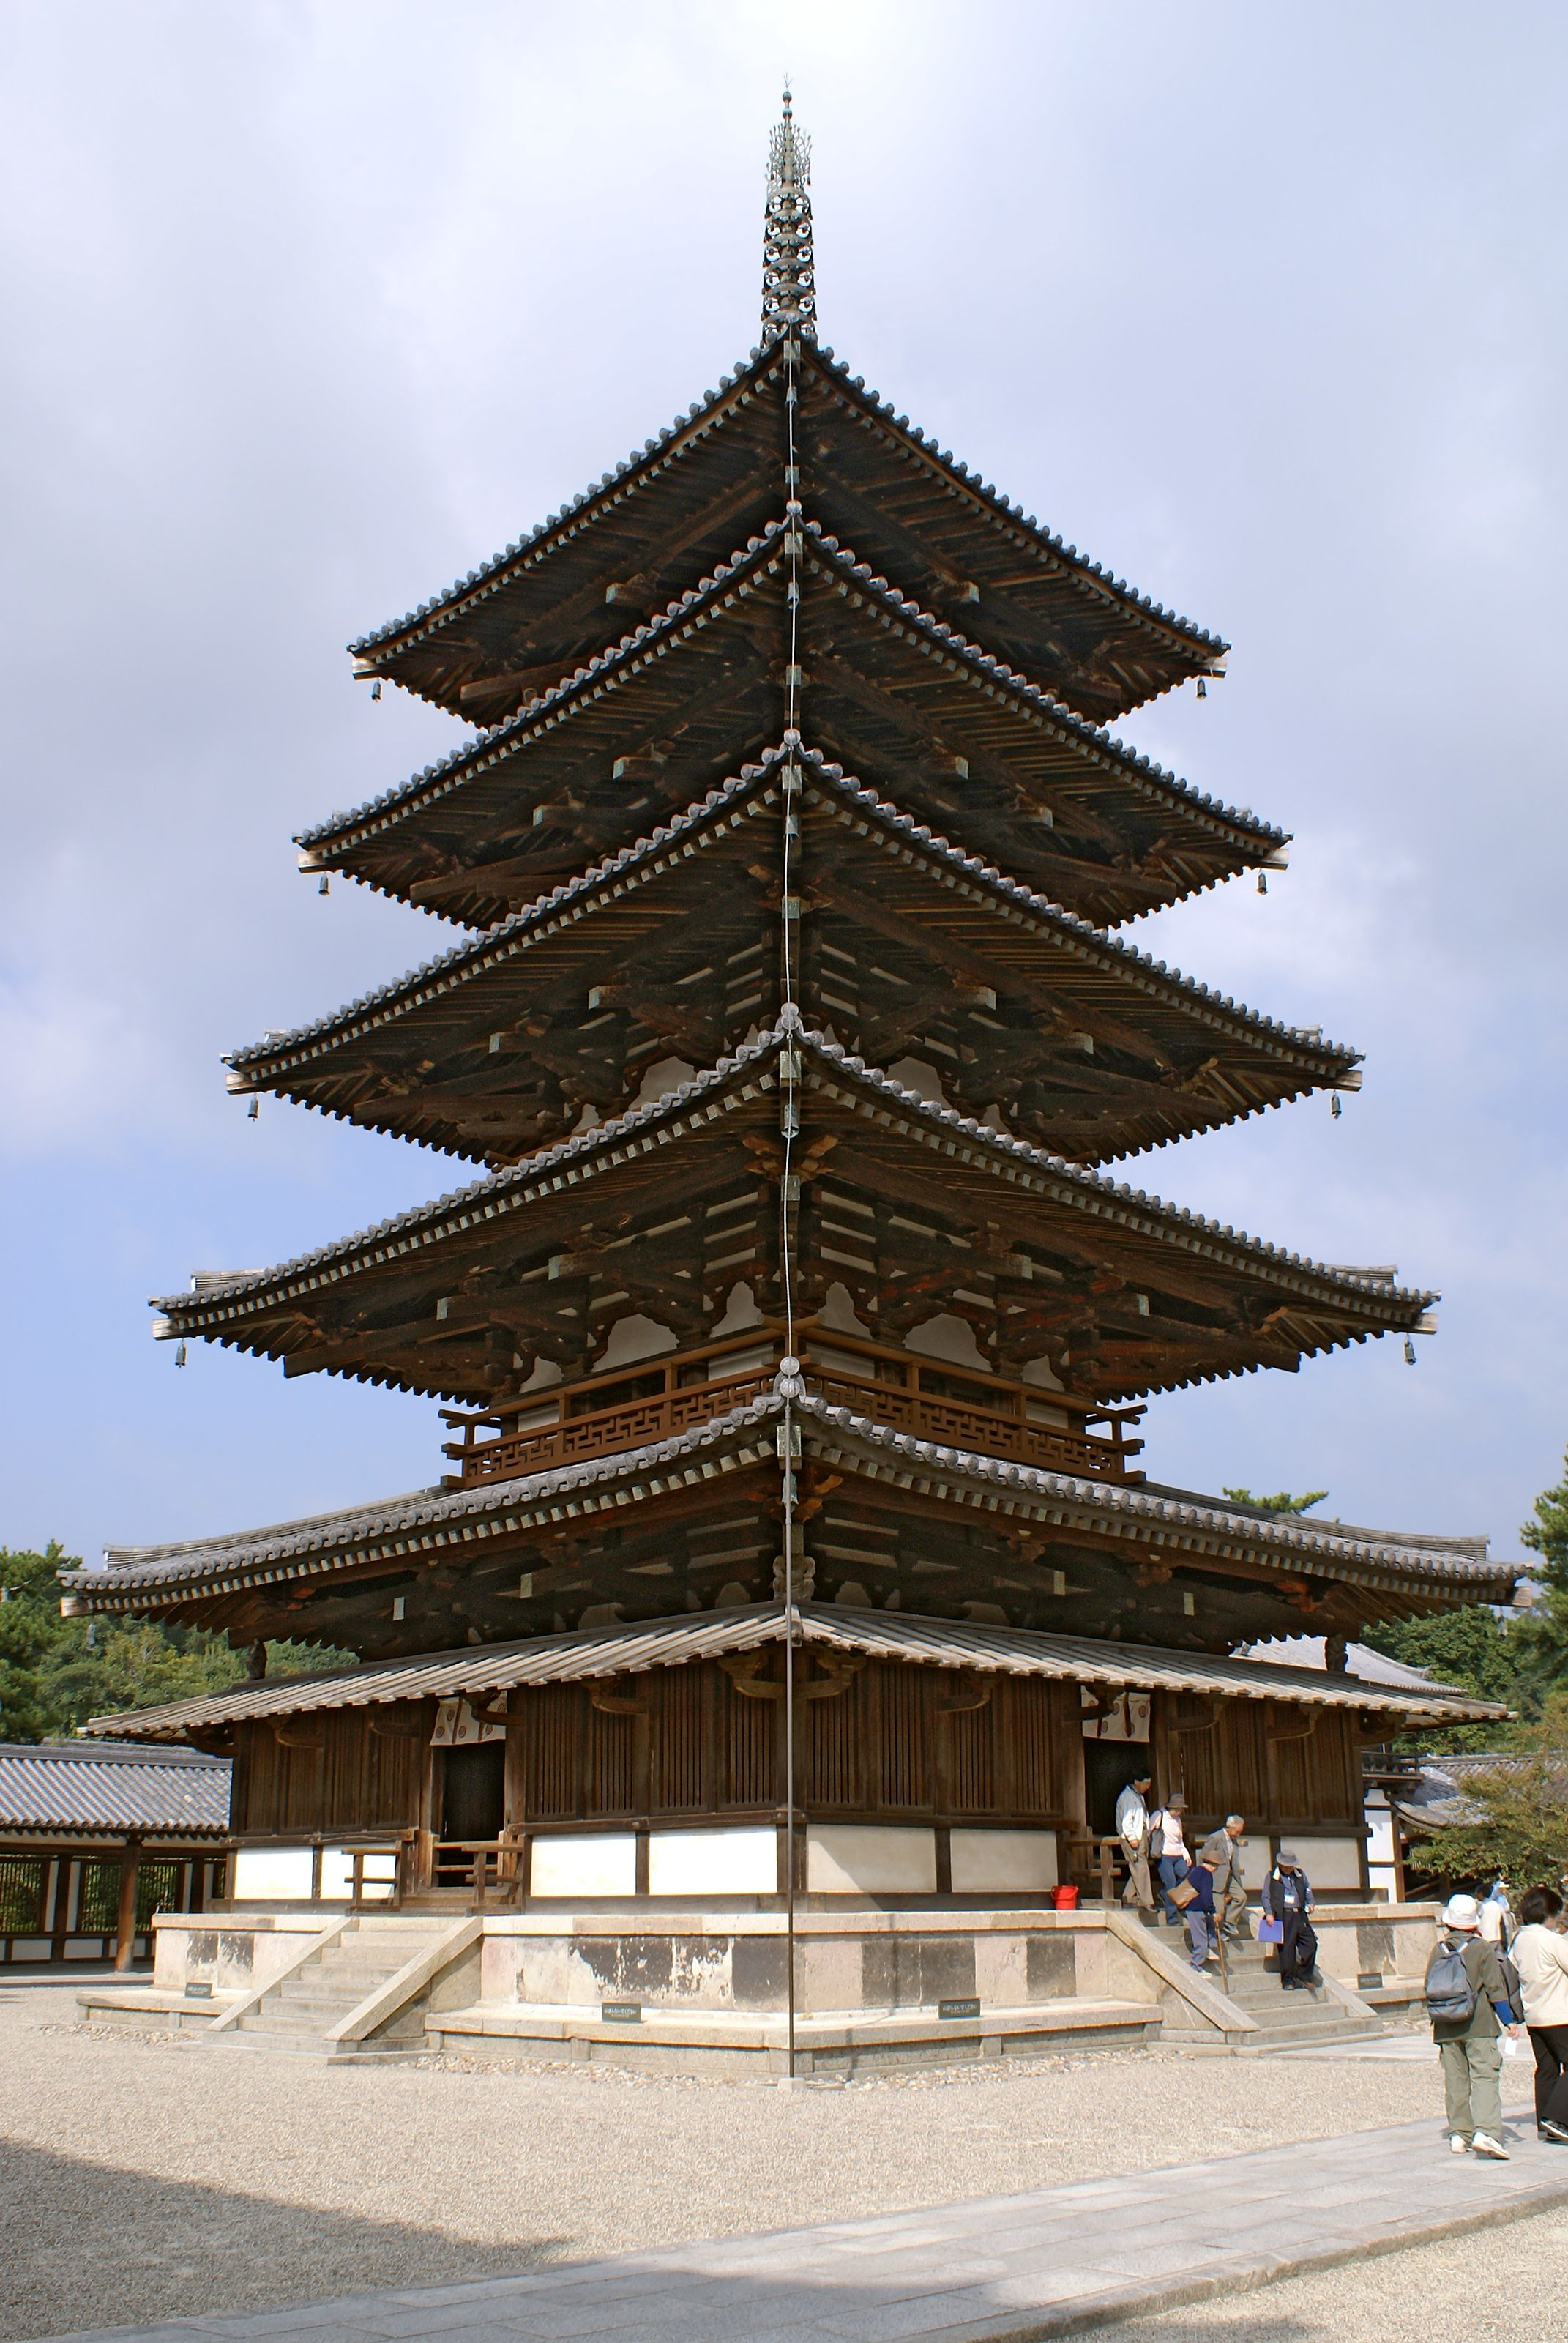 wooden five story pagoda of hōryū ji in japan built in the 7th